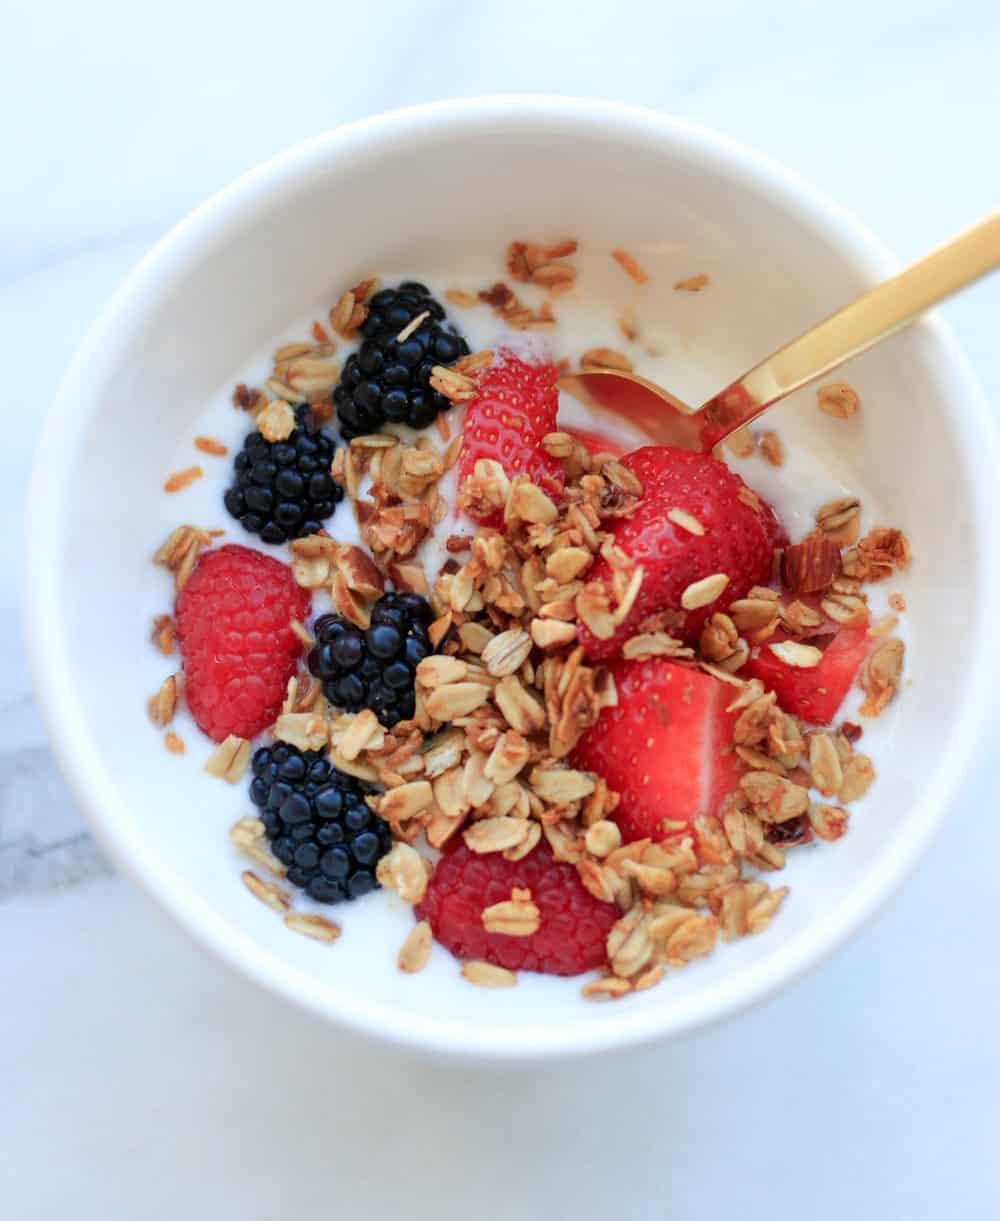 homemade+french+style+yogurt+recipe+from+everyday+parisian.